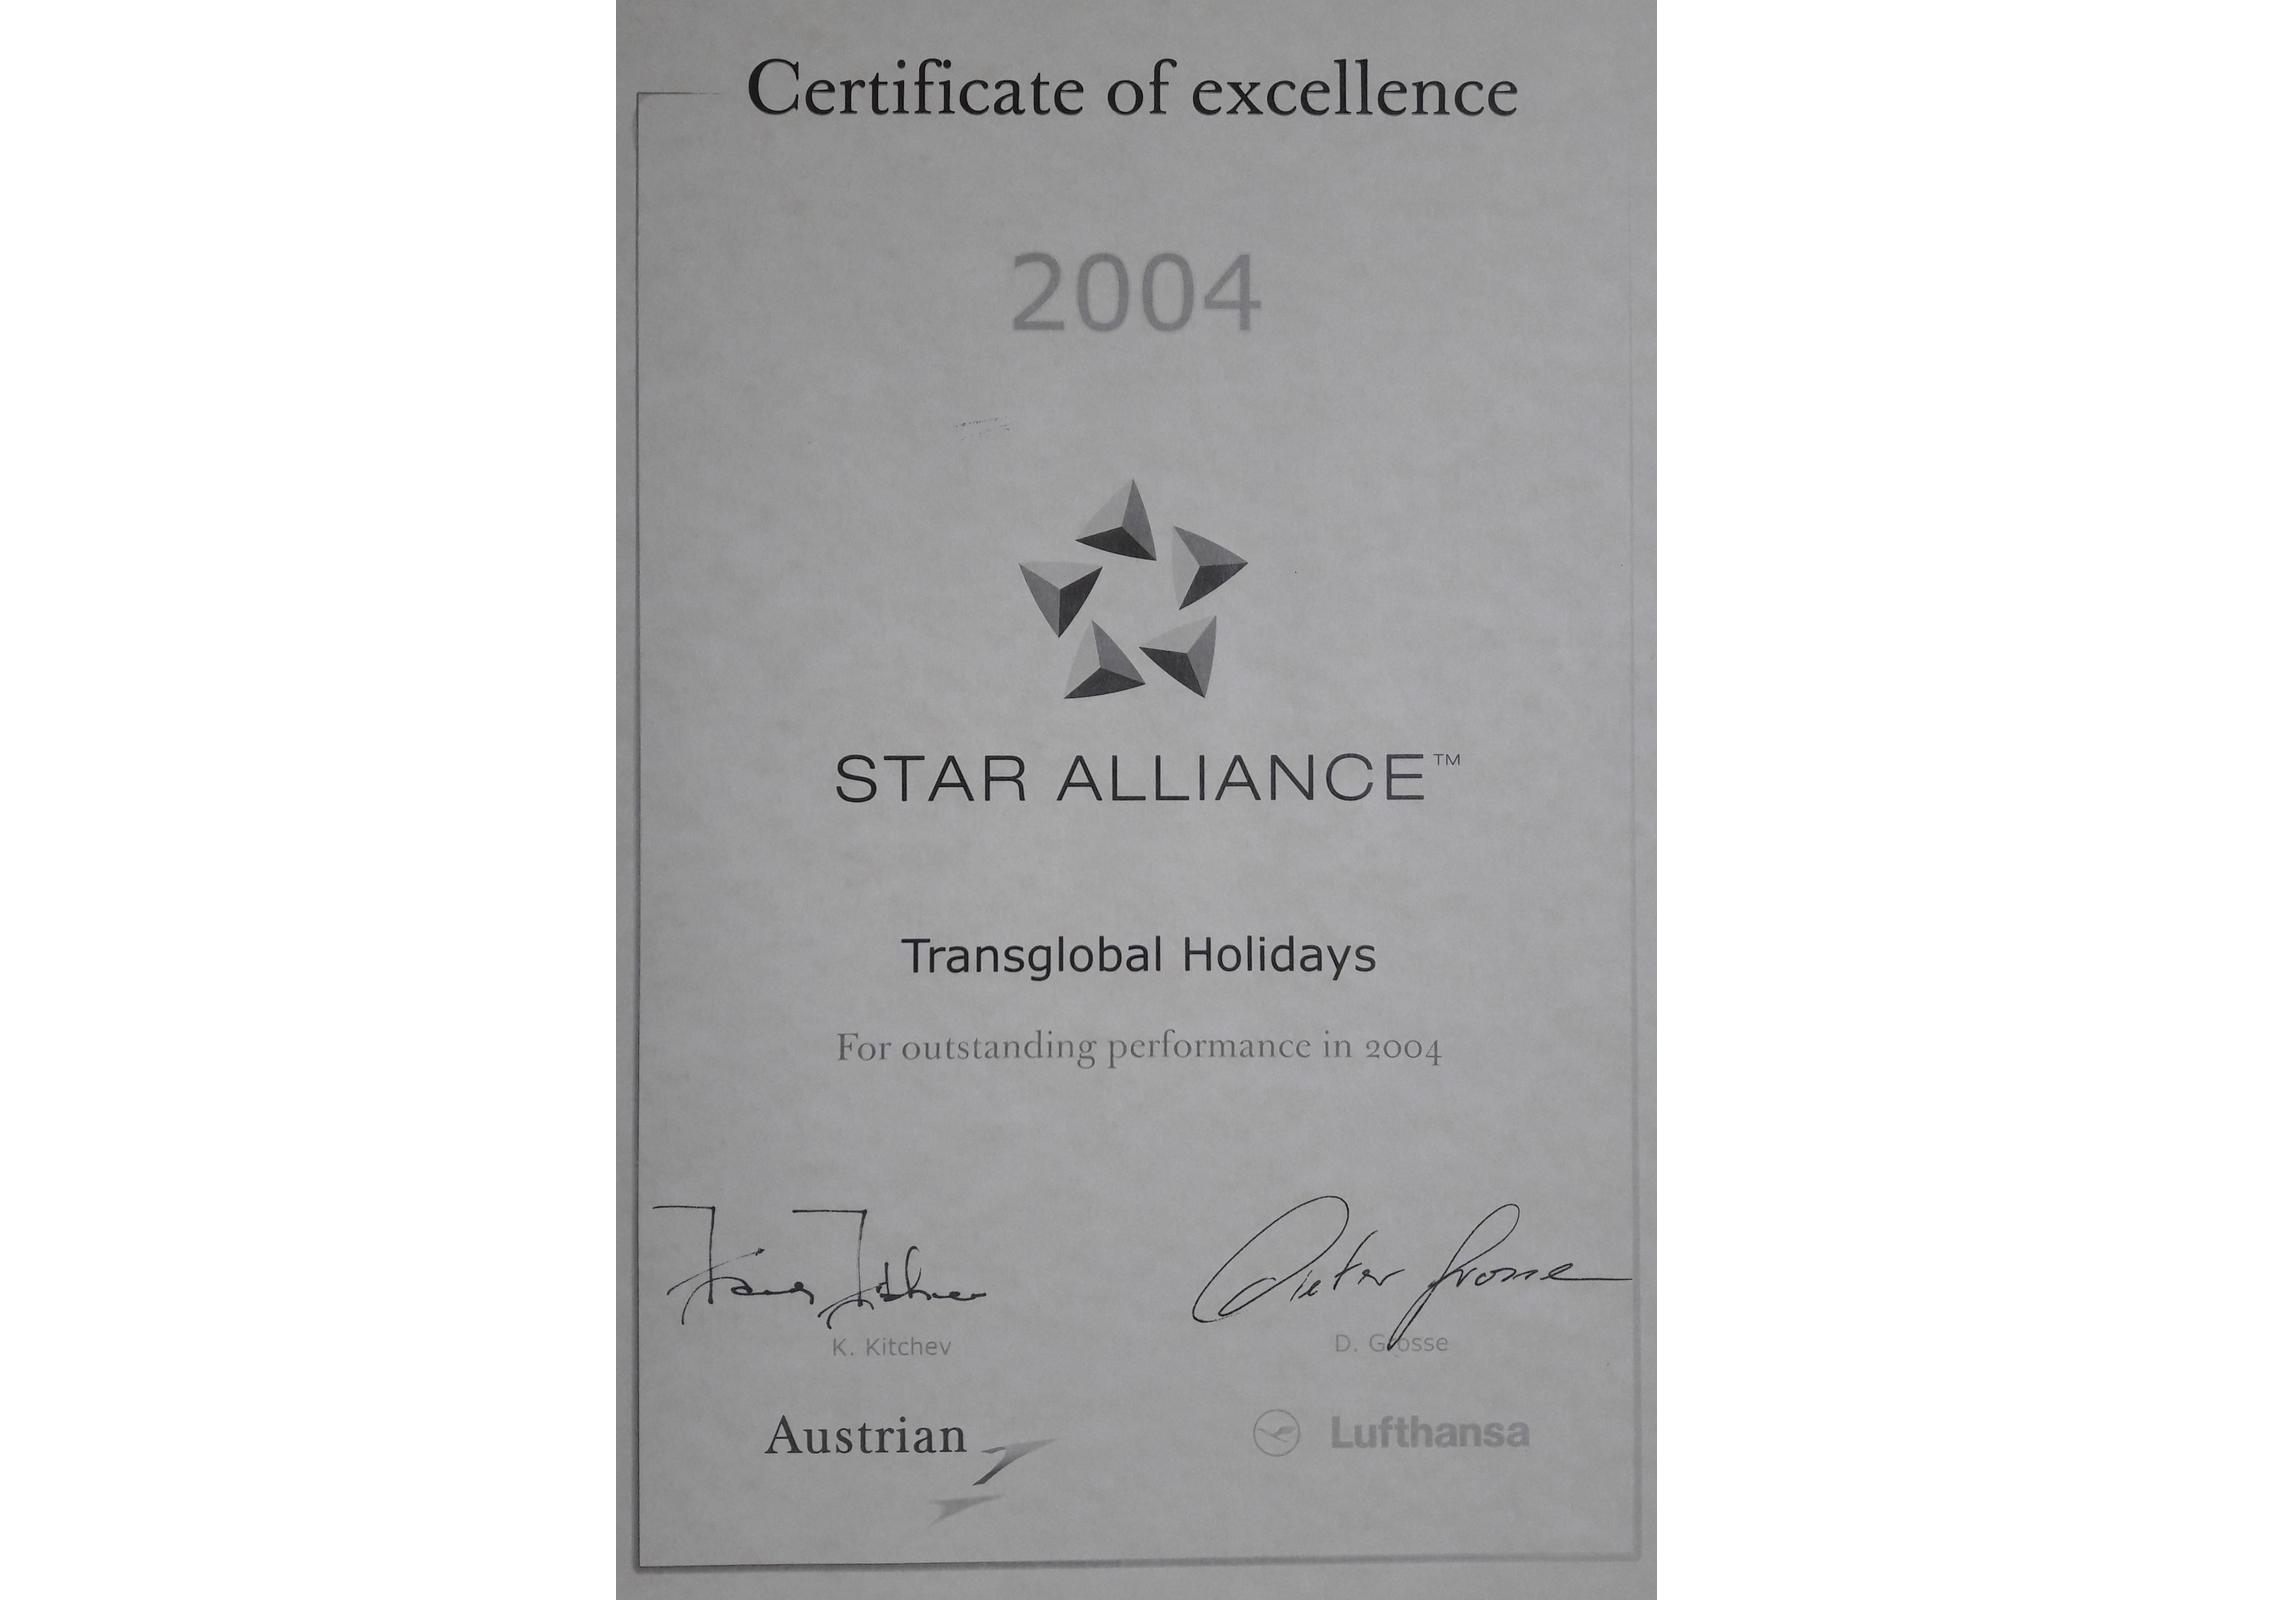 Star Alliance Certificate